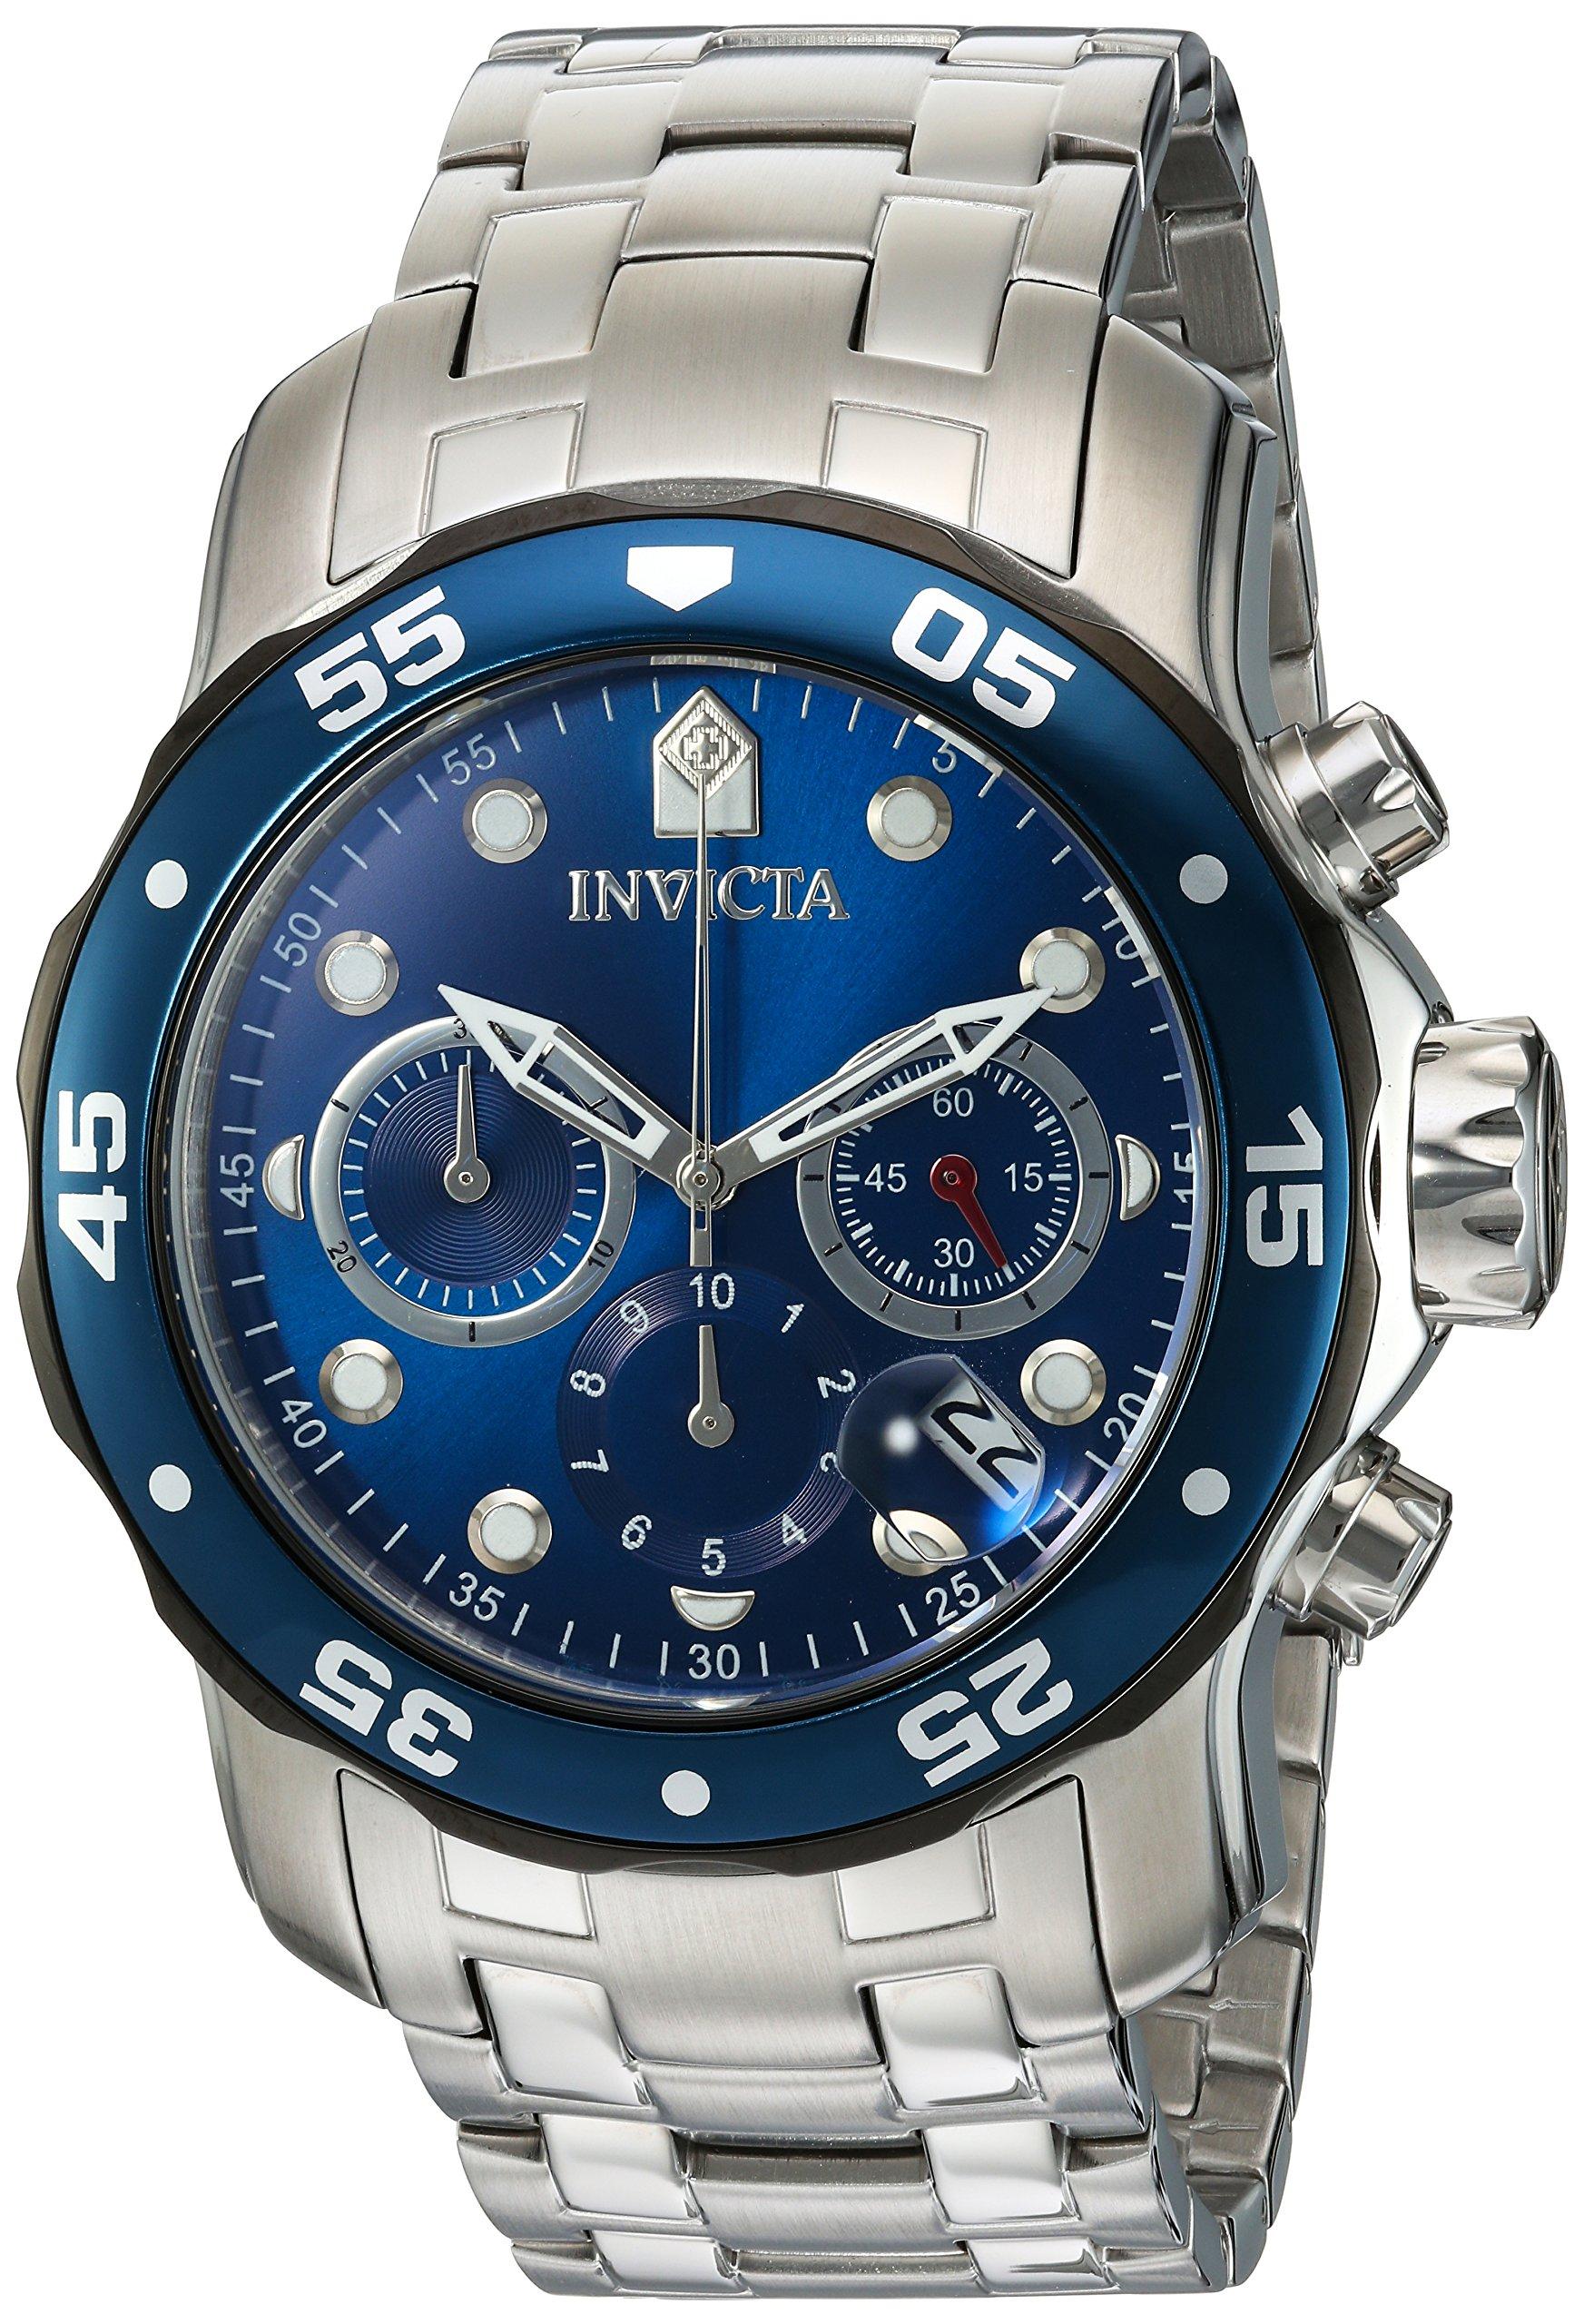 Invicta 21784 Pro Diver Reloj para Hombre acero inoxidable Cuarzo Esfera azul